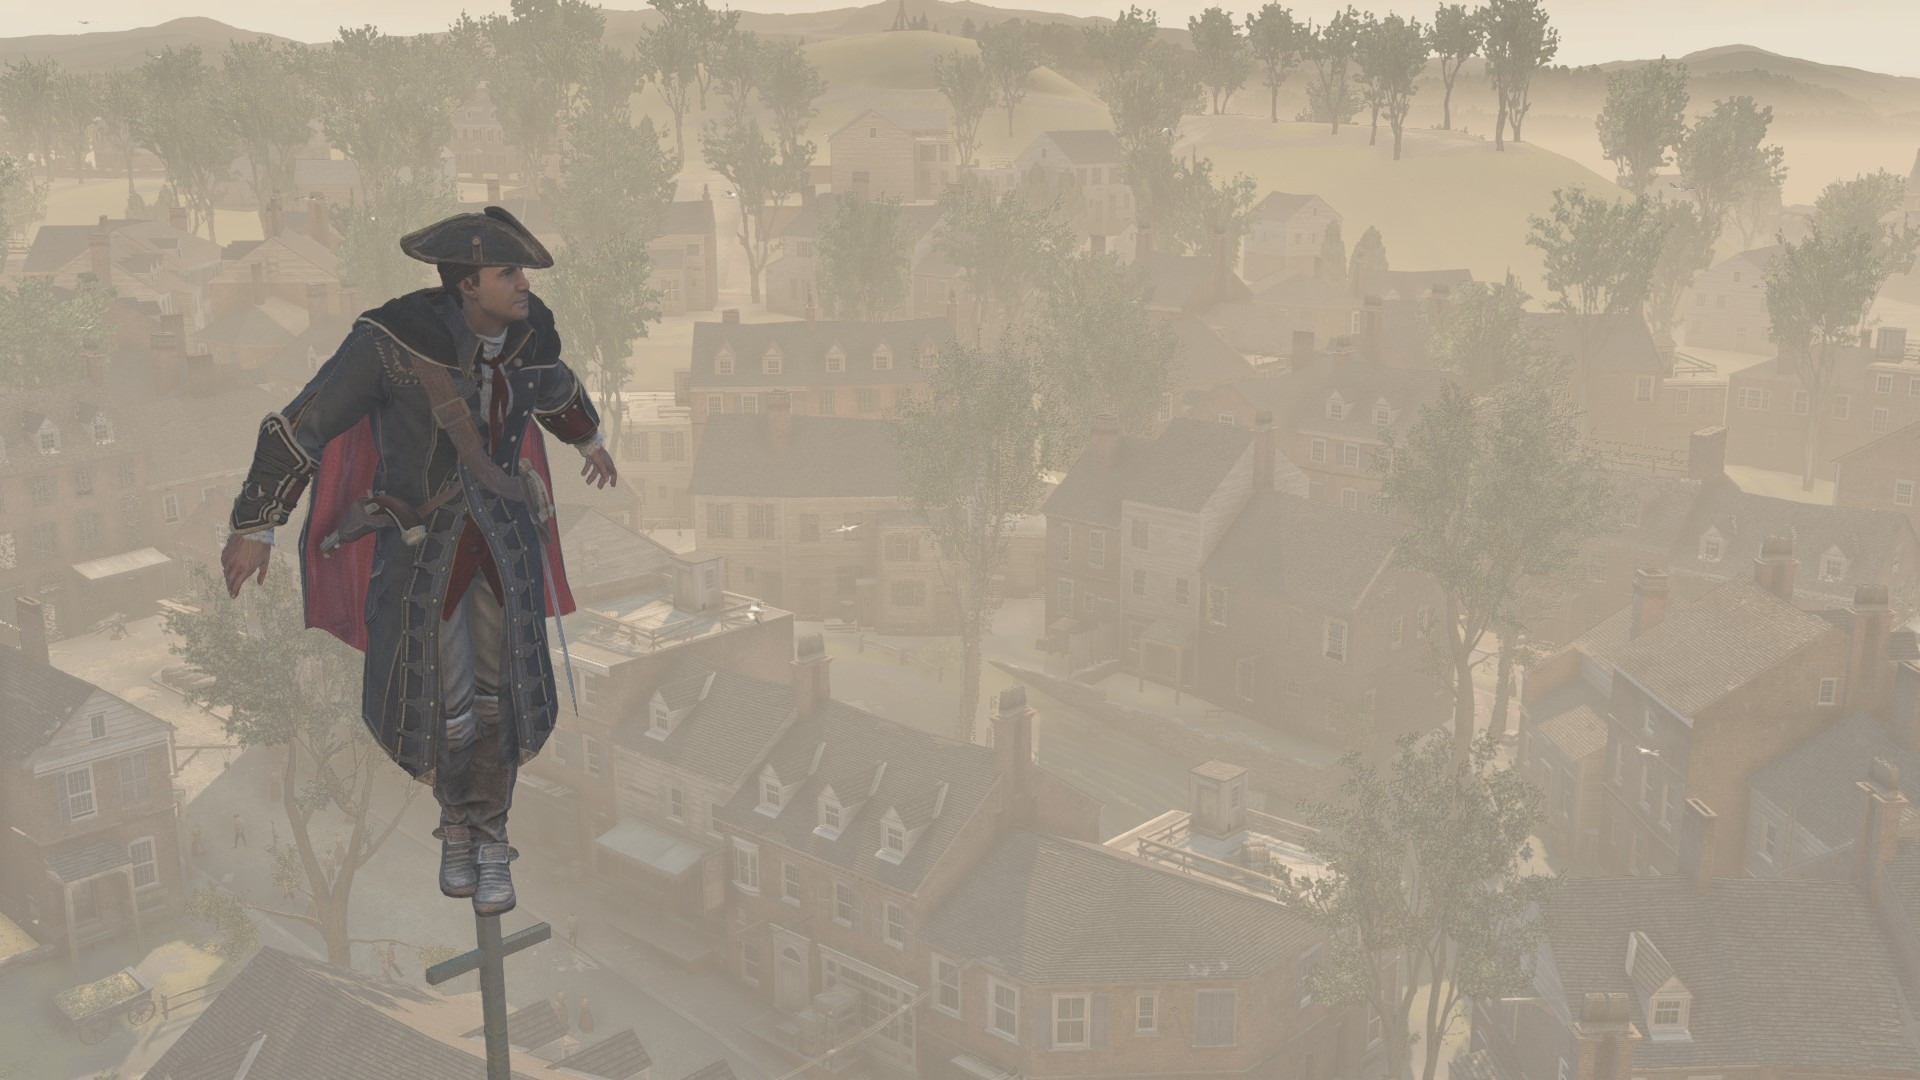 [CONTEST] Assassin's Creed Screenshots C0moMFKa